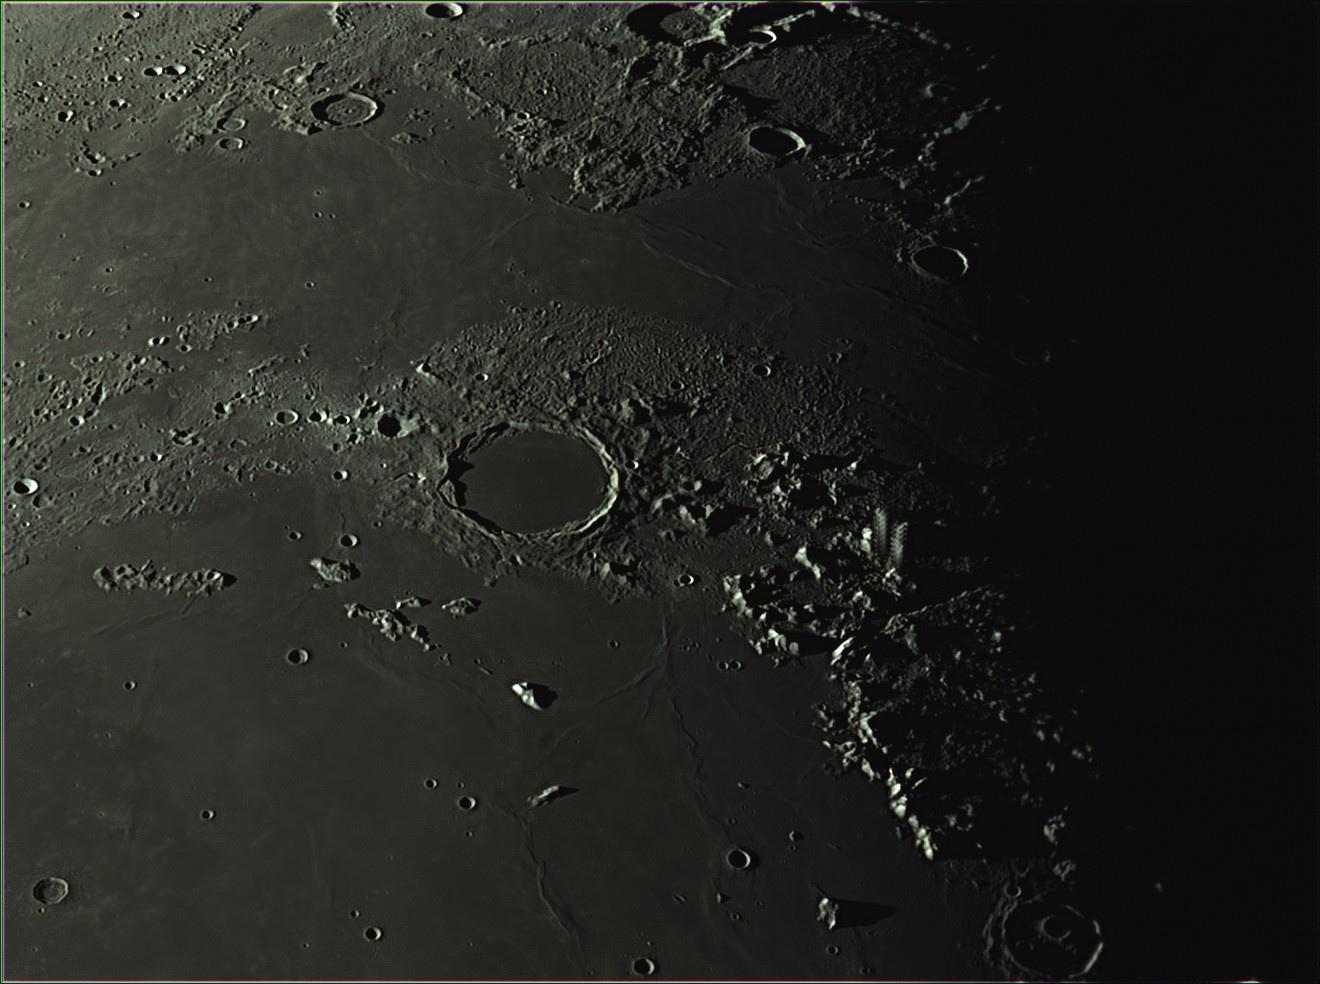 Platon Apo 150 2400mm 2019-09-21-0516bis.jpg